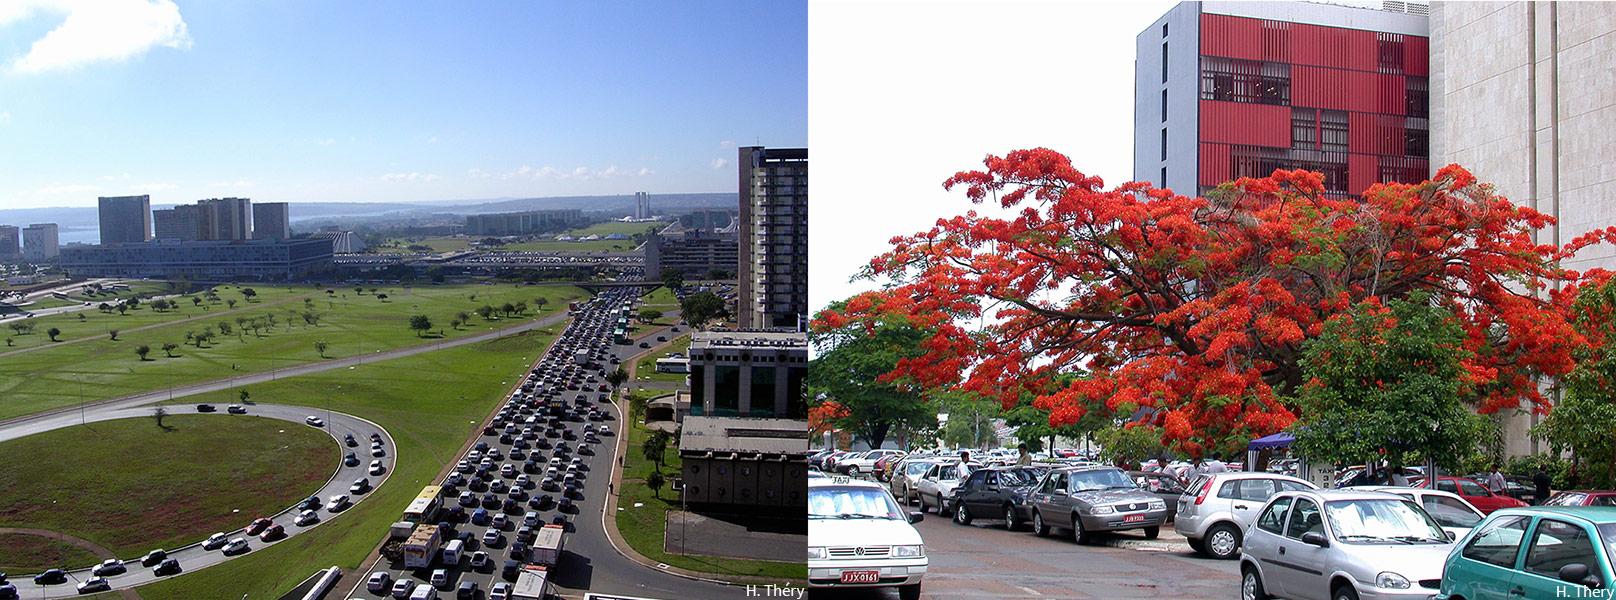 Hervé Théry — photographie bouchons à Brasilia